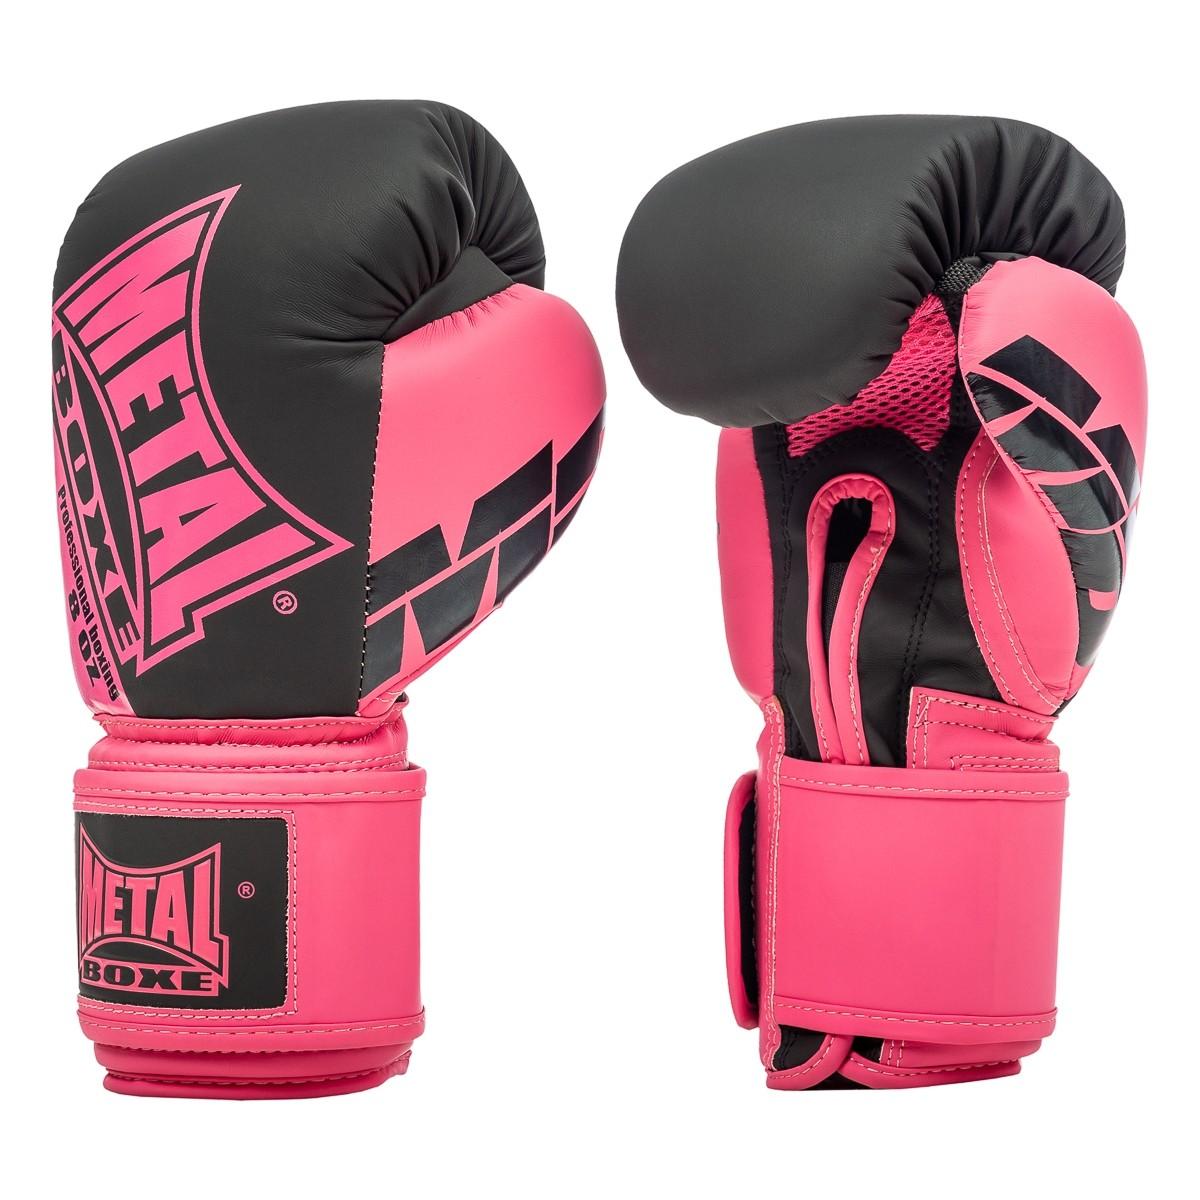 gants boxe femme